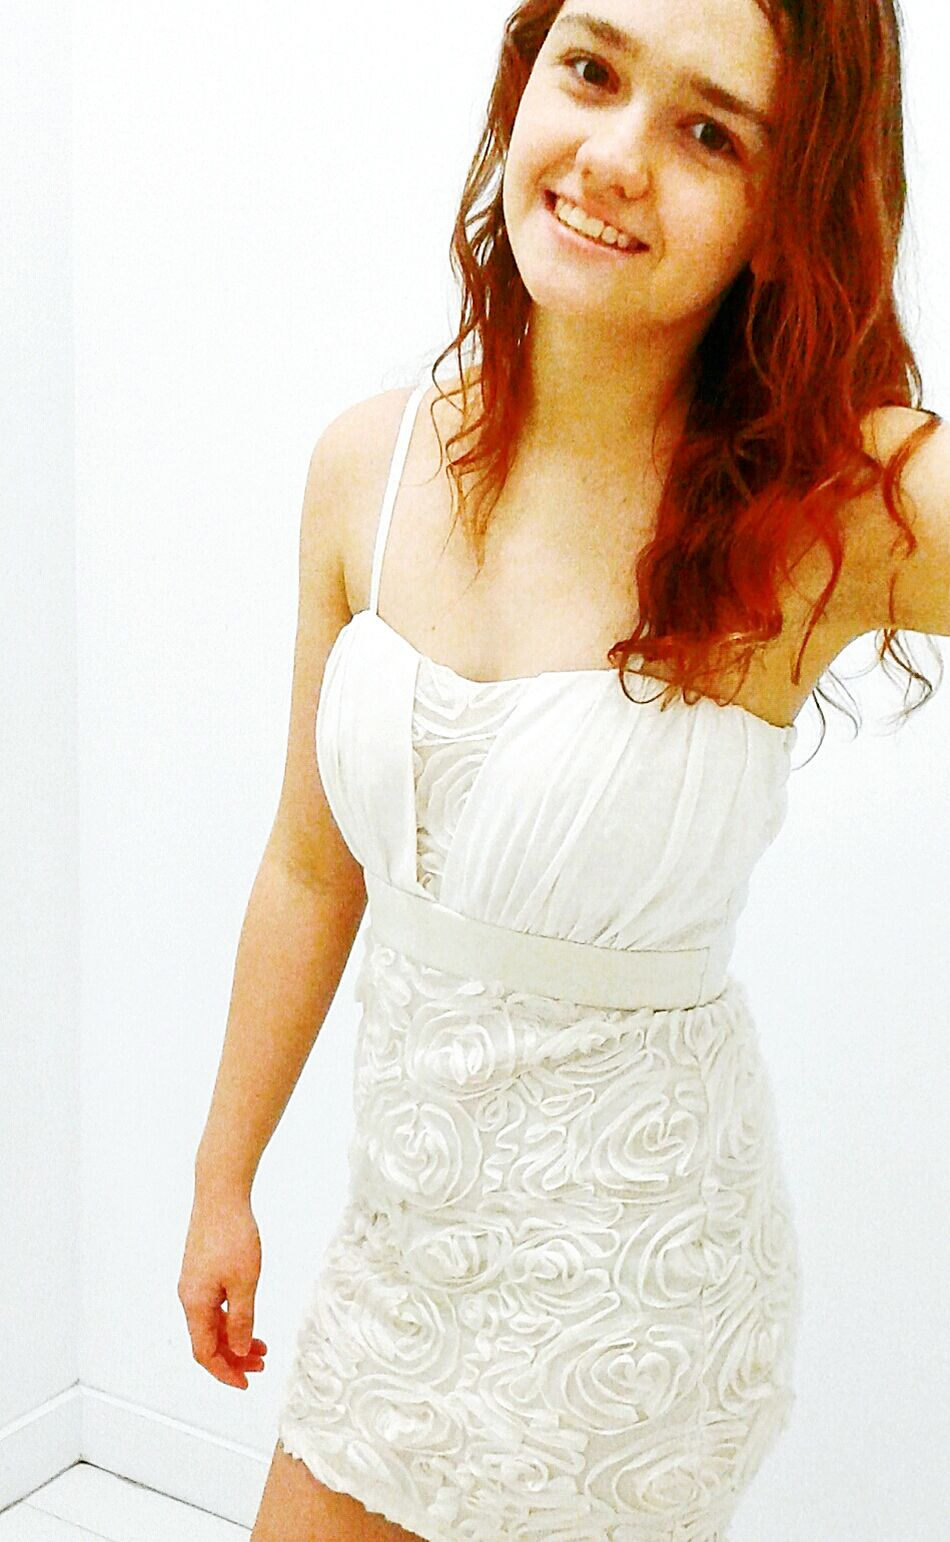 Dressed In White Splash Of Color Red Hair Model